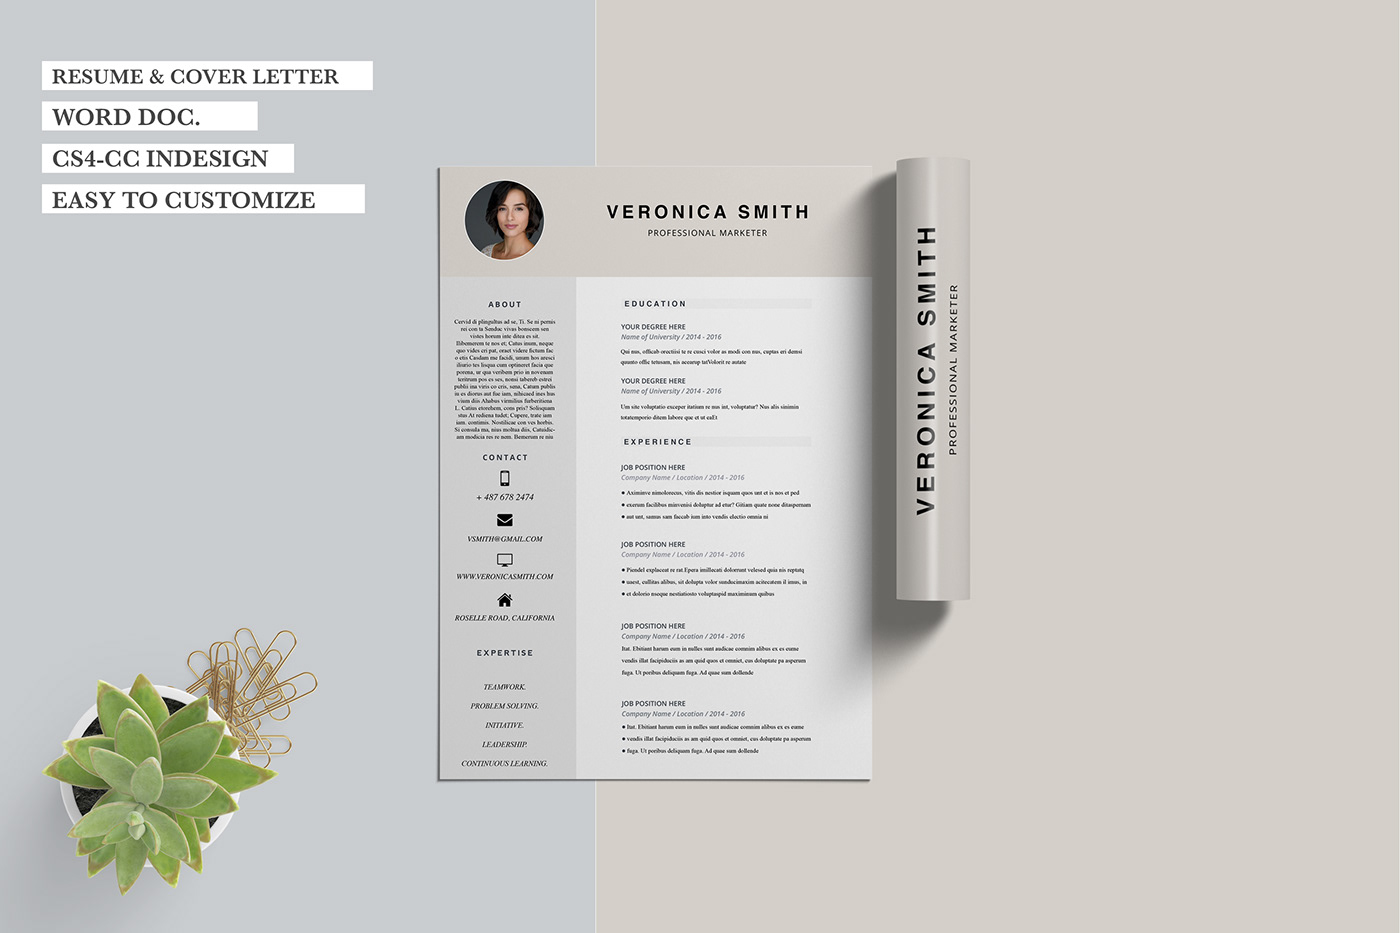 Resume CV resume template cover letter template Free Resume free clean resume feminine resume feminine resume example